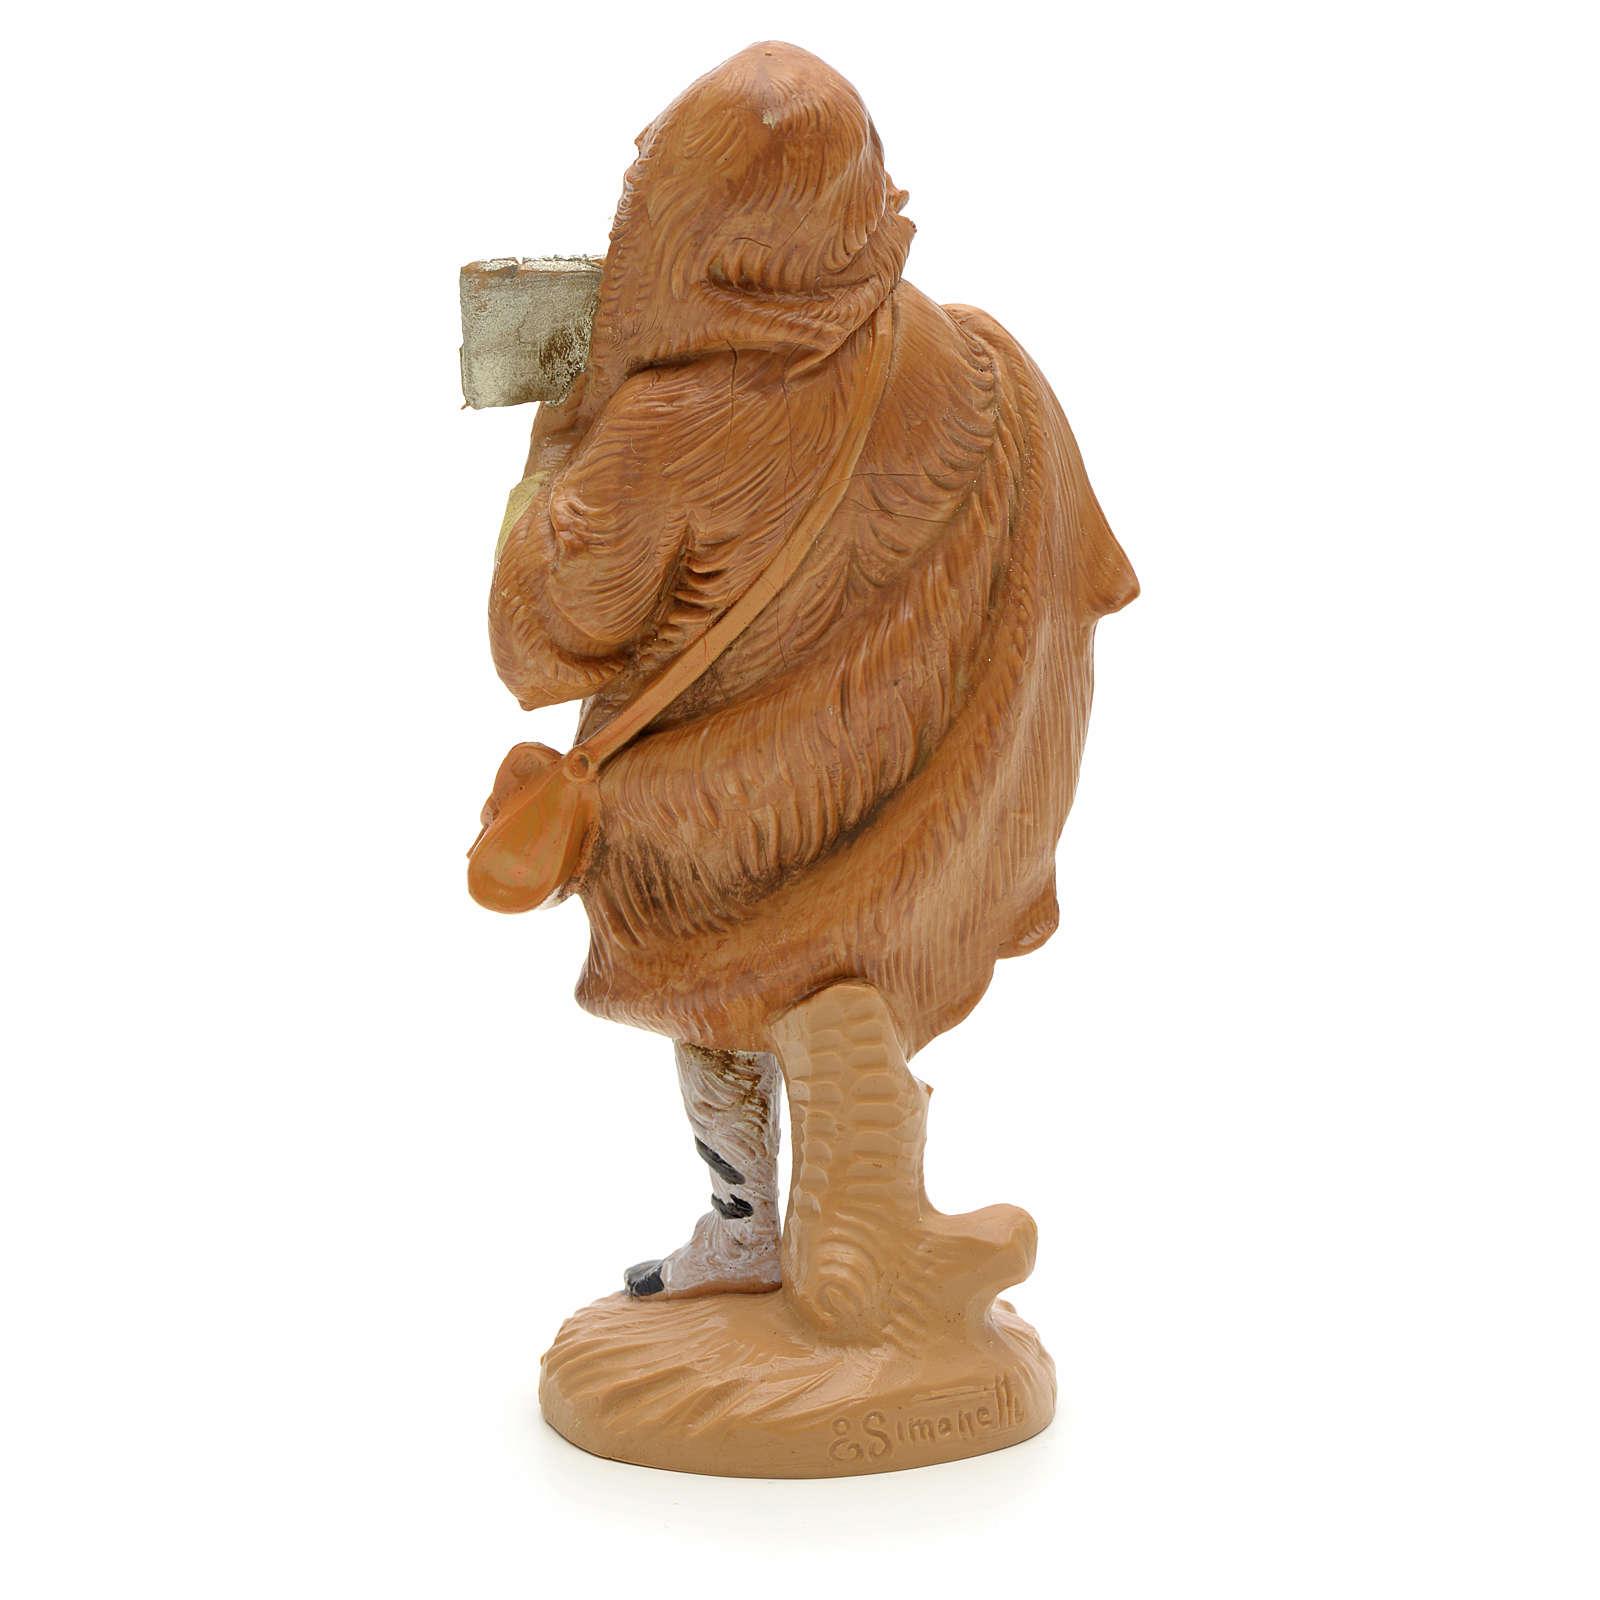 Pastor com flauta de pã presépio 12 cm Fontanini 3